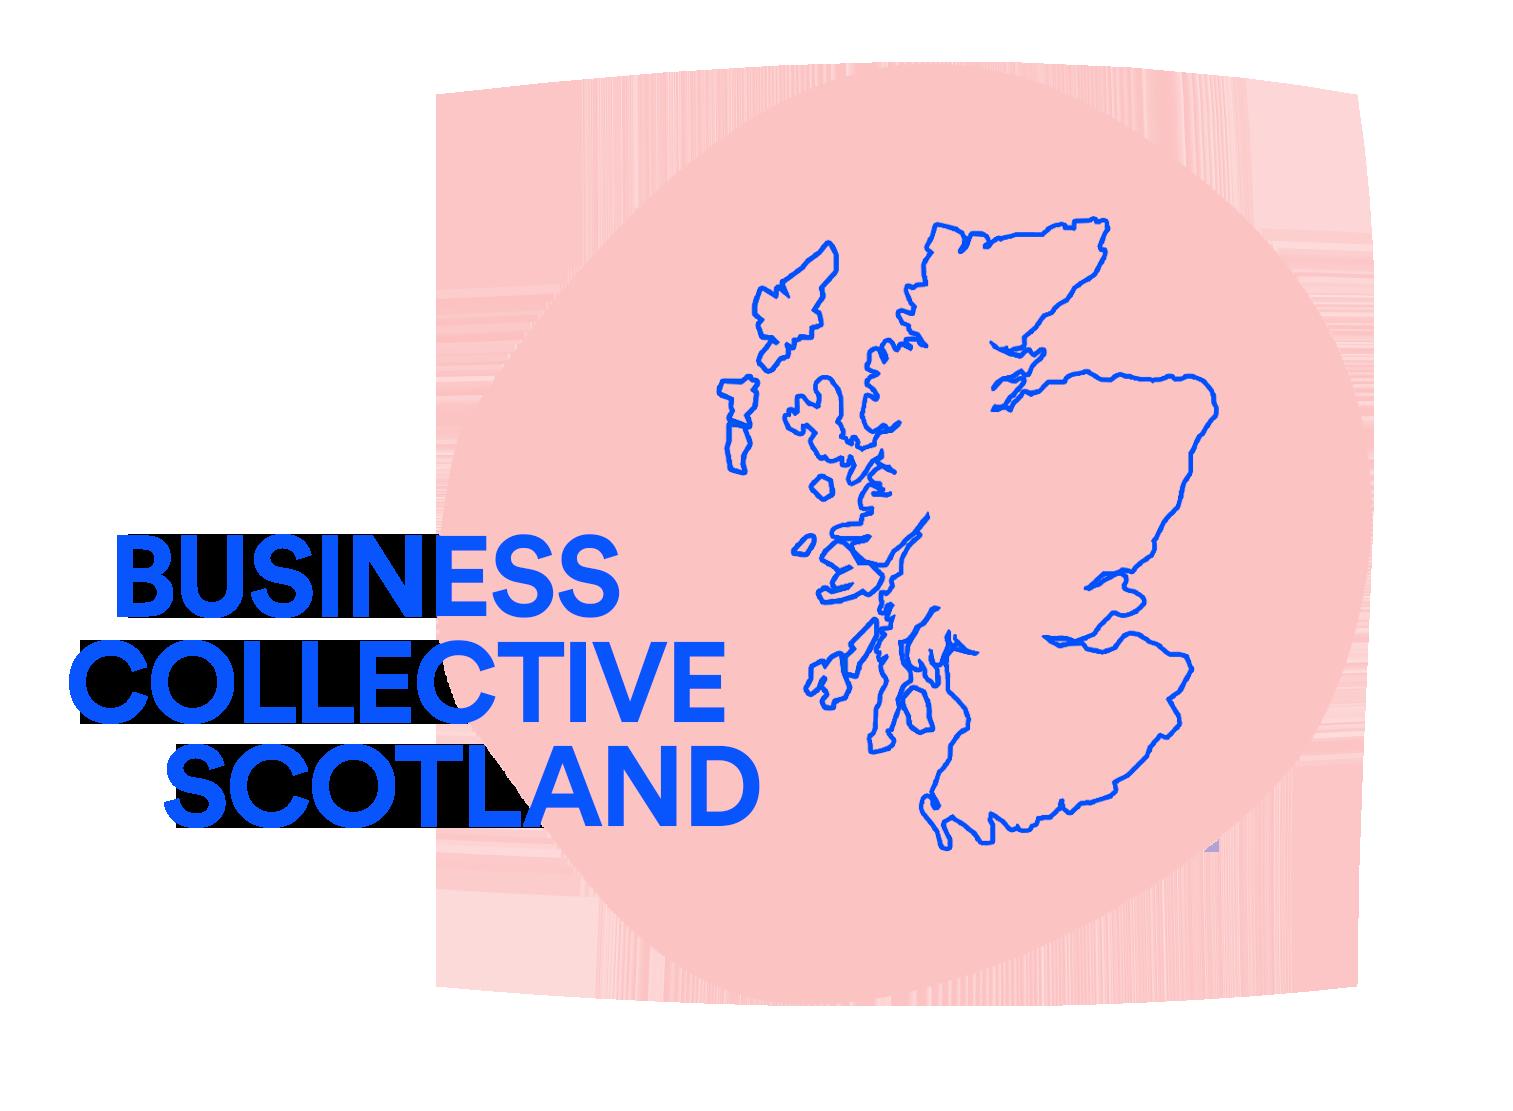 scottish business collective logo.